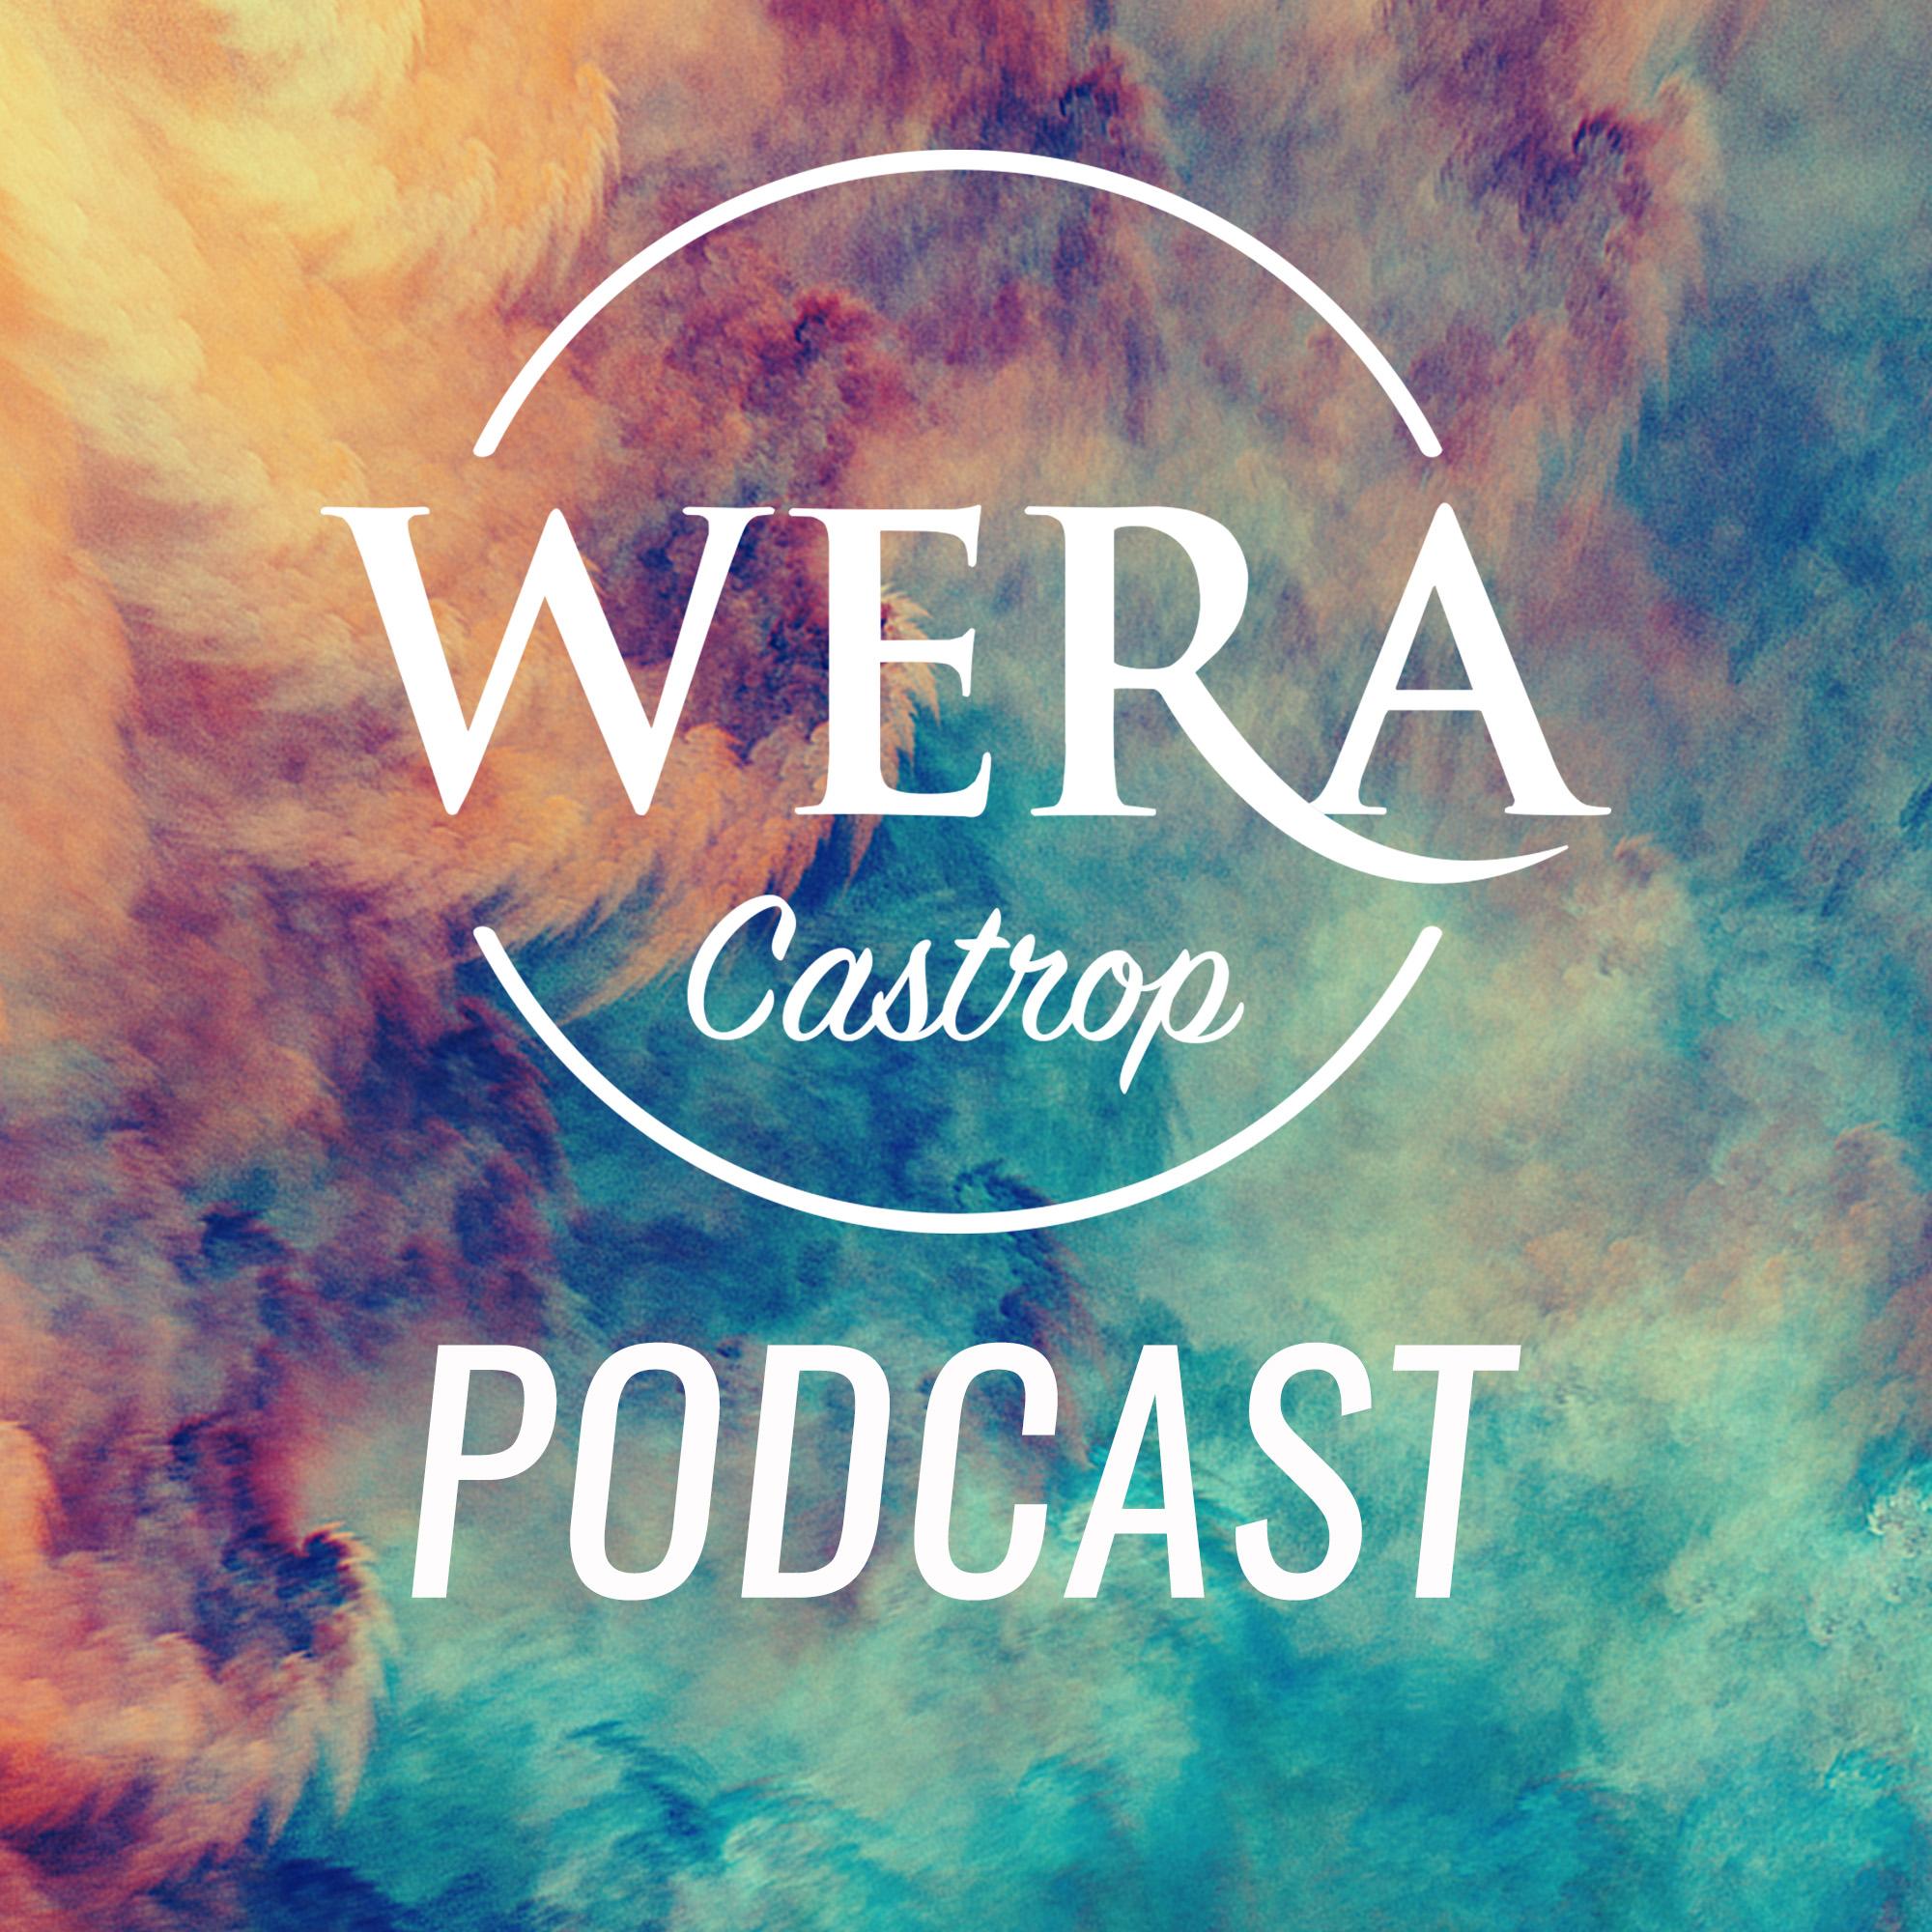 WERA Castrop Podcast